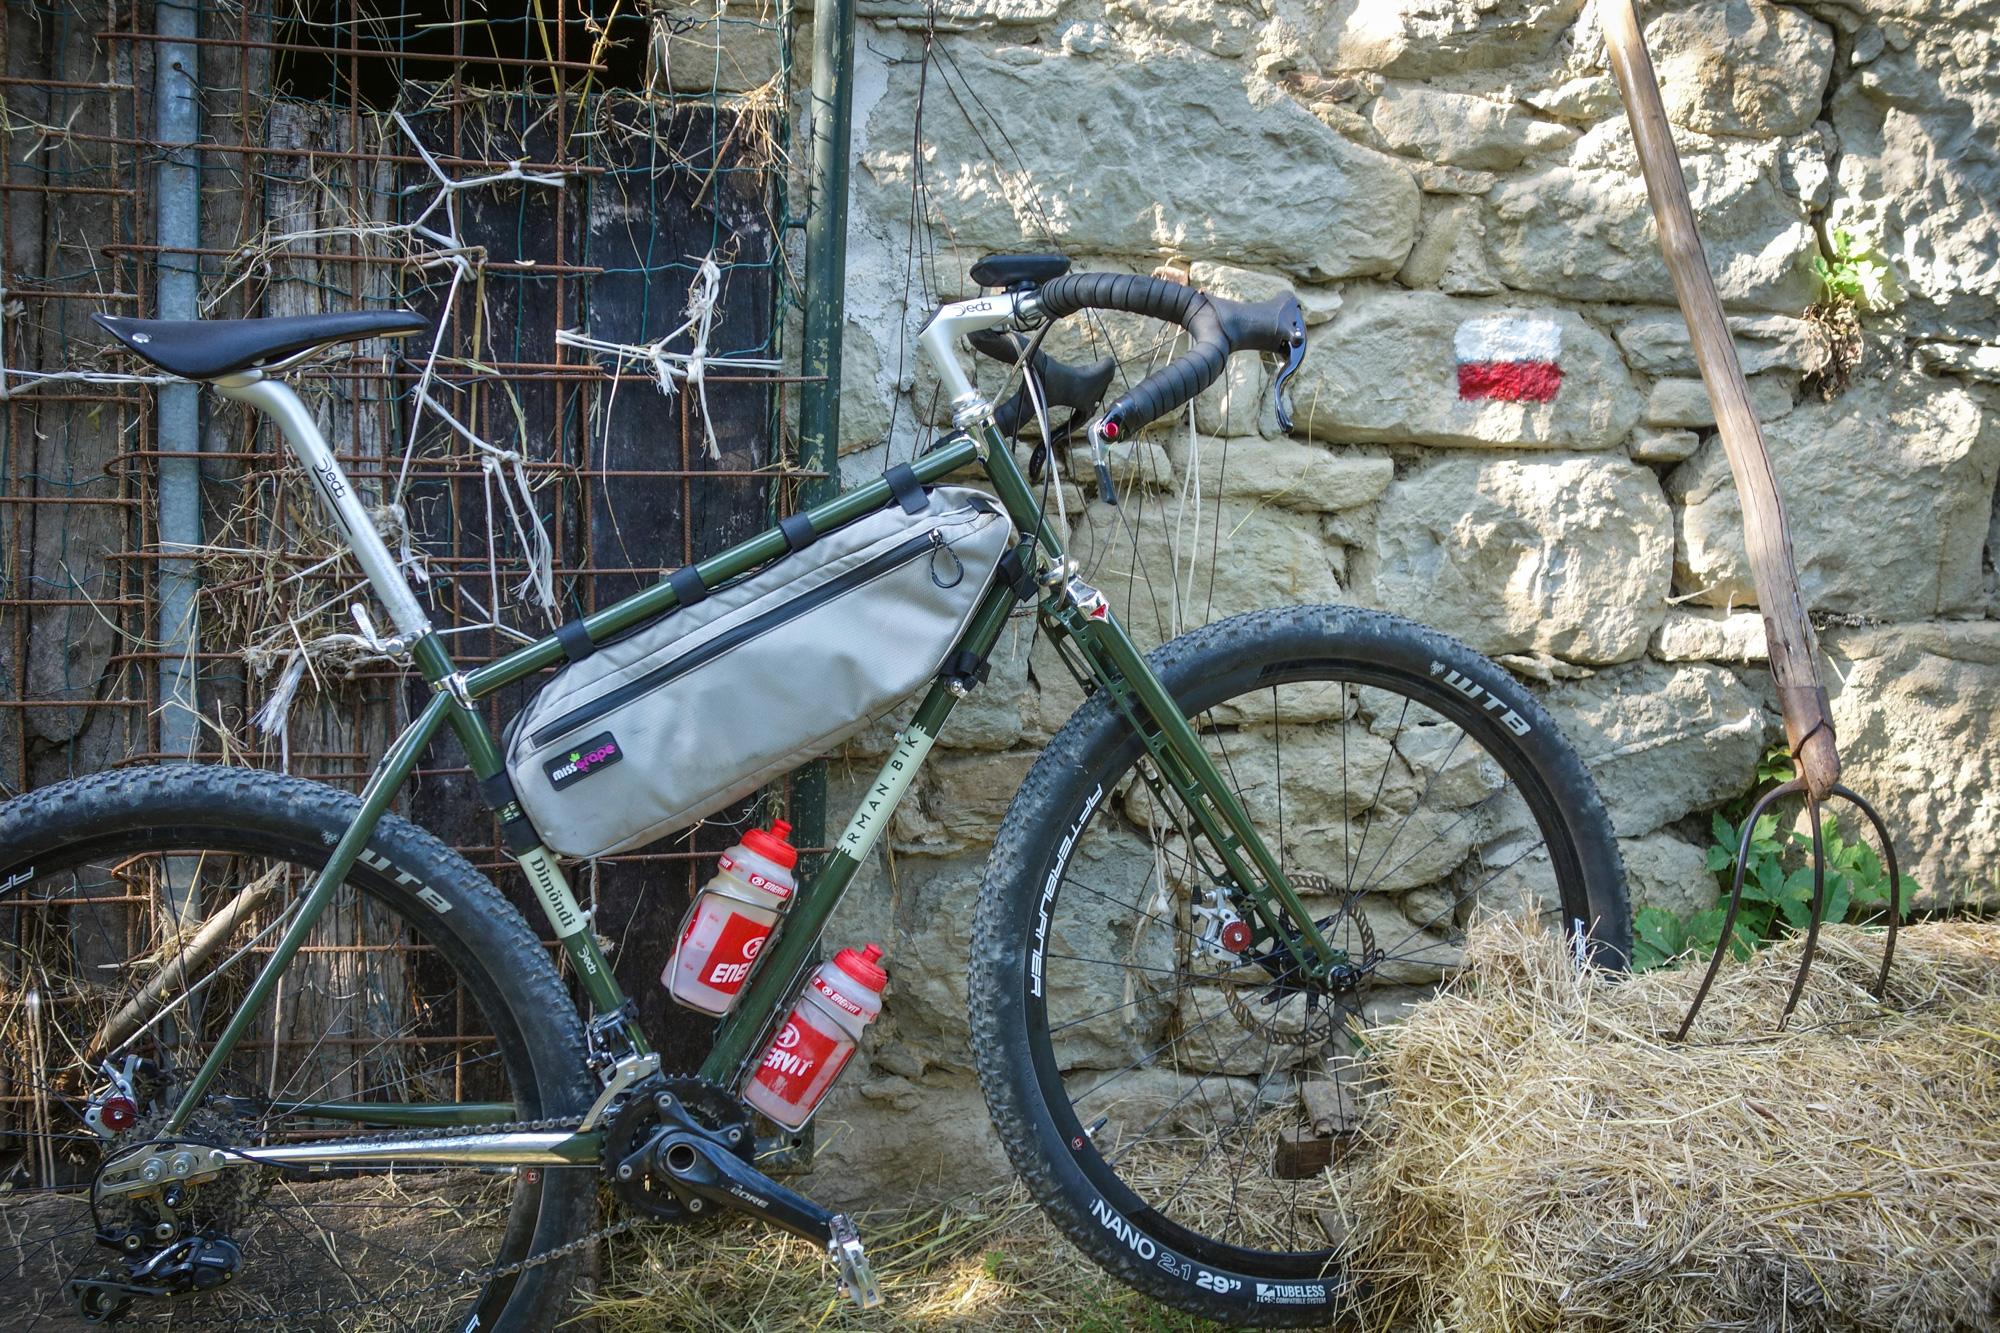 zocca_mtb_ride_appennino_modenese_erman_bike_dimondi-7